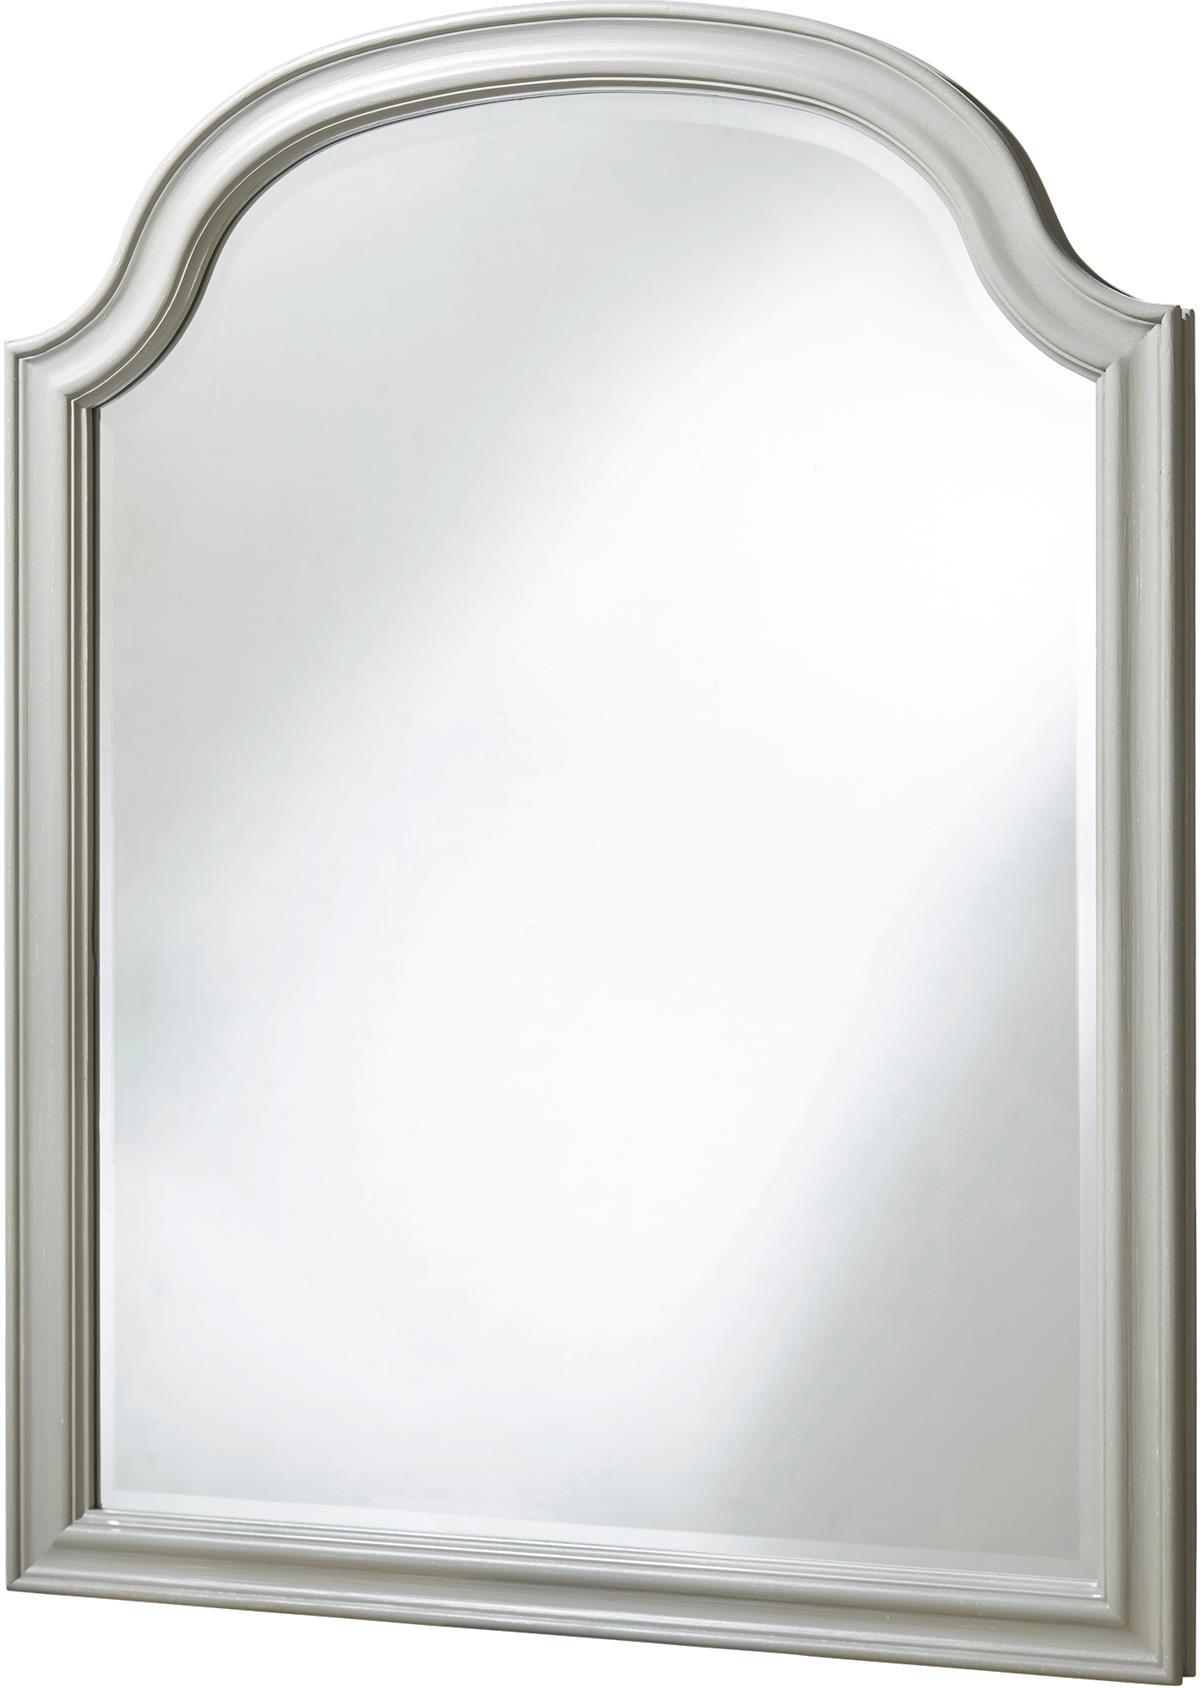 Paula Deen by Universal Dogwood Mirror - Item Number: 59904M